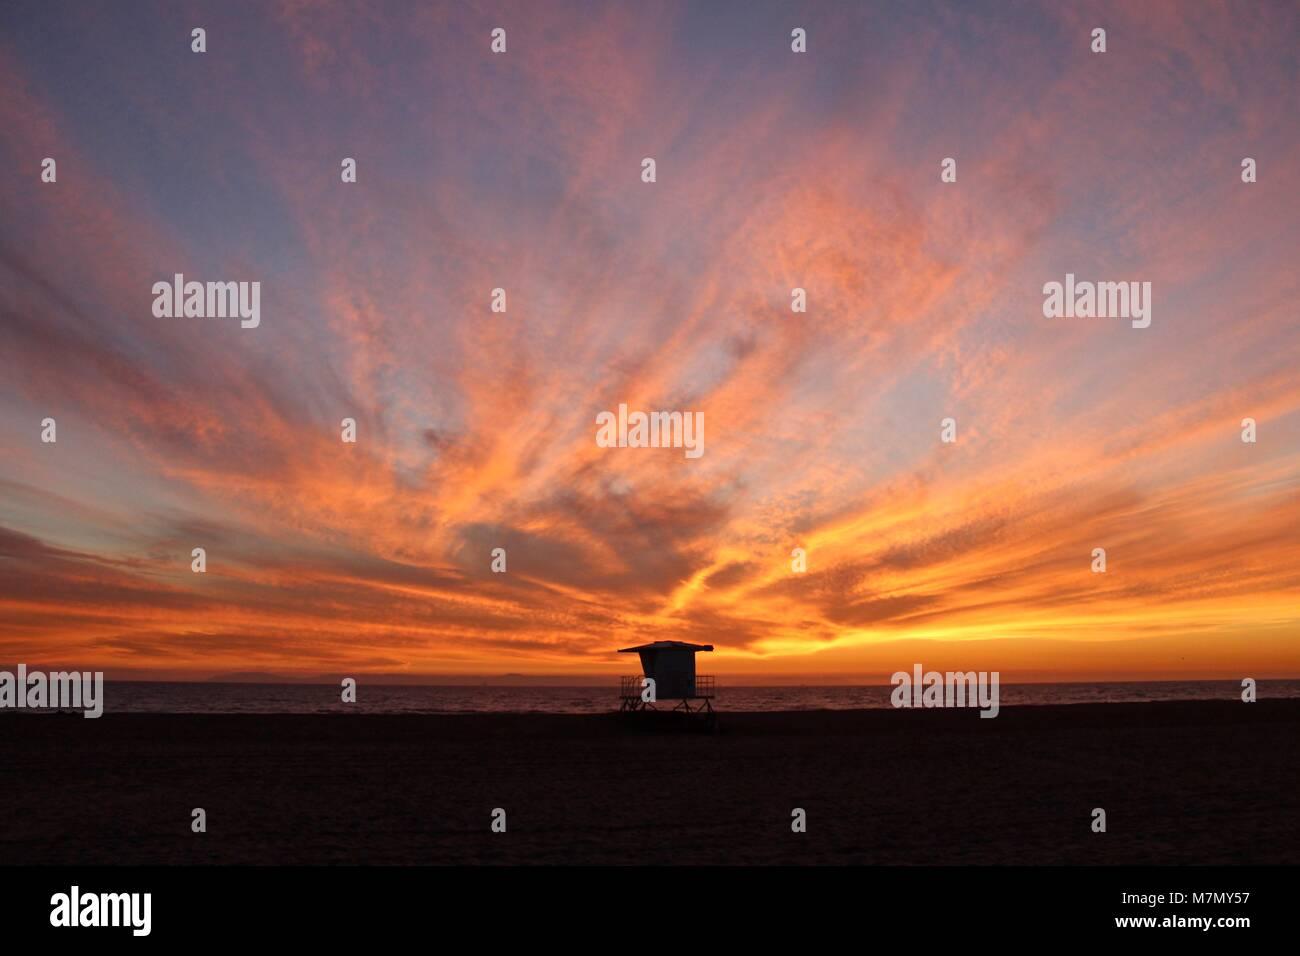 Huntington Beach Sunset with lifeguard tower - Stock Image